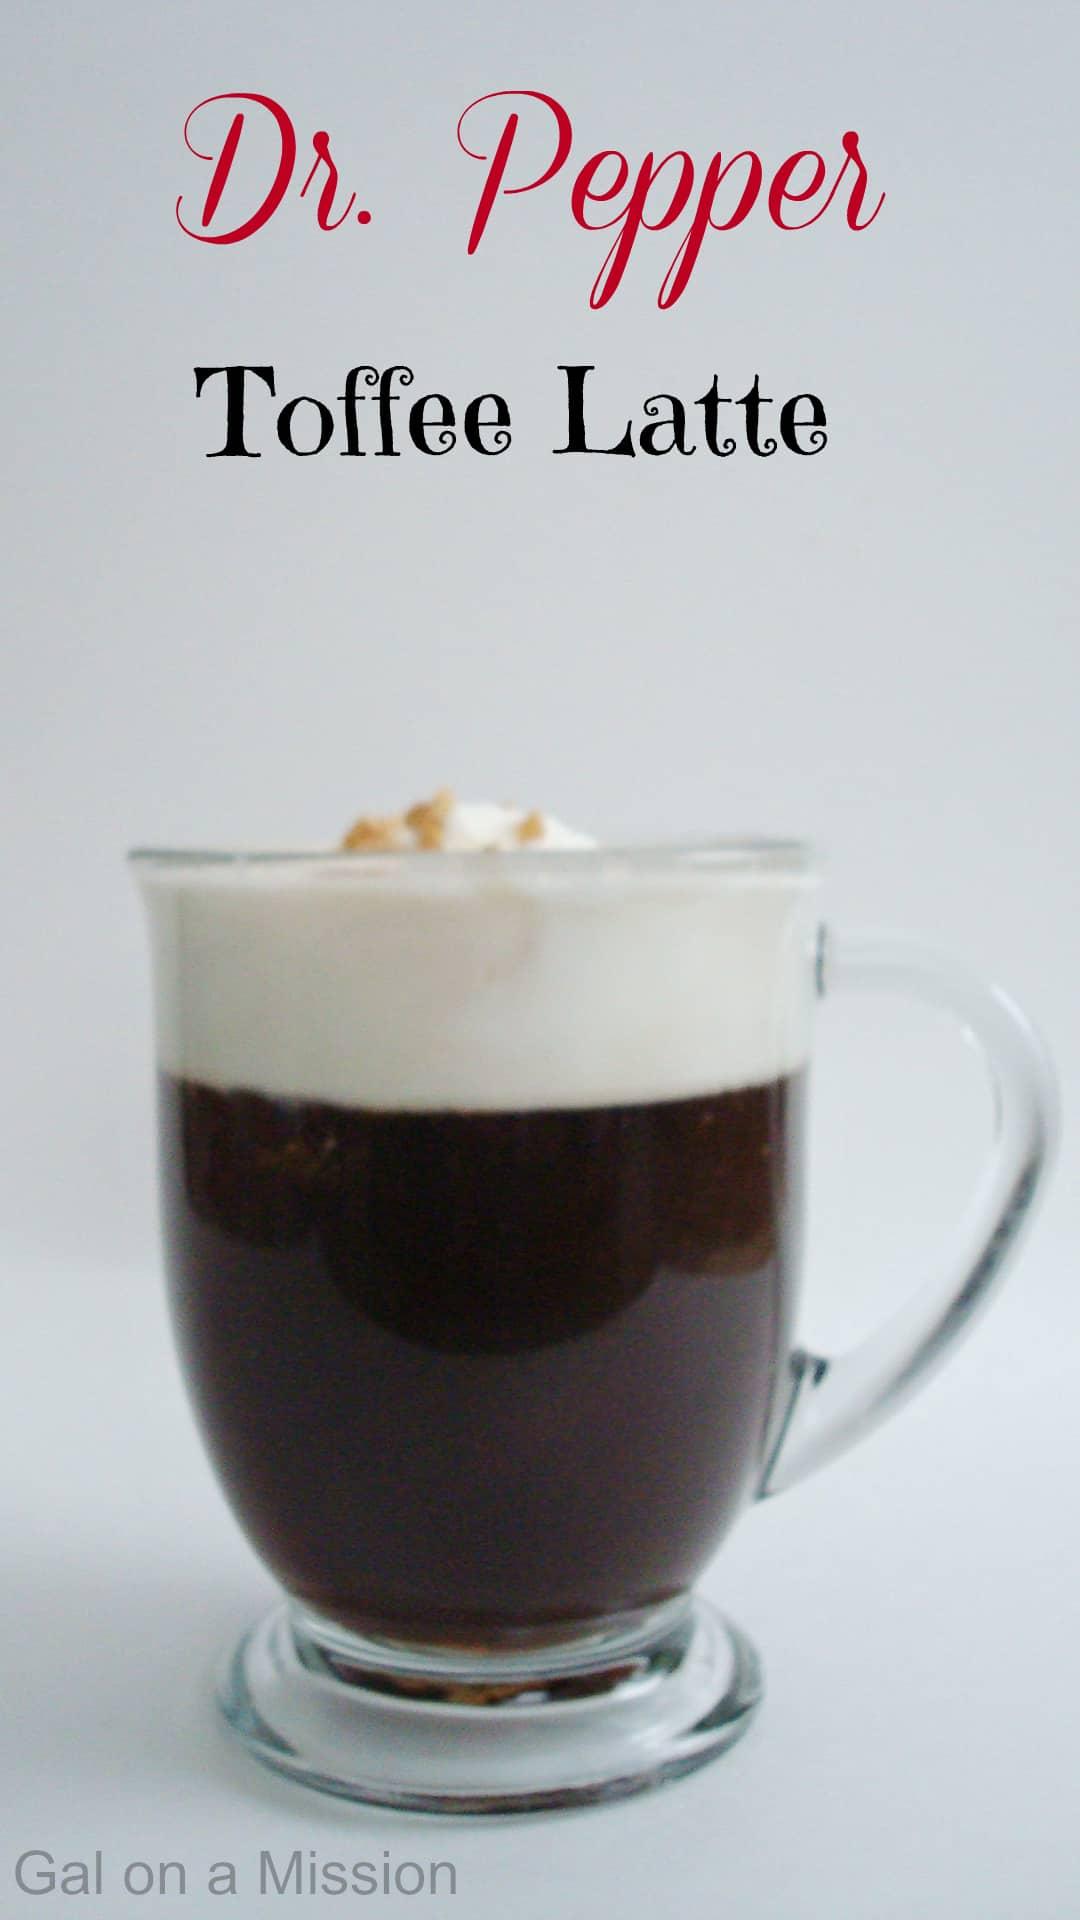 Dr. Pepper Toffee Latte #Warm #Soda #Yummy #Drink #Latte